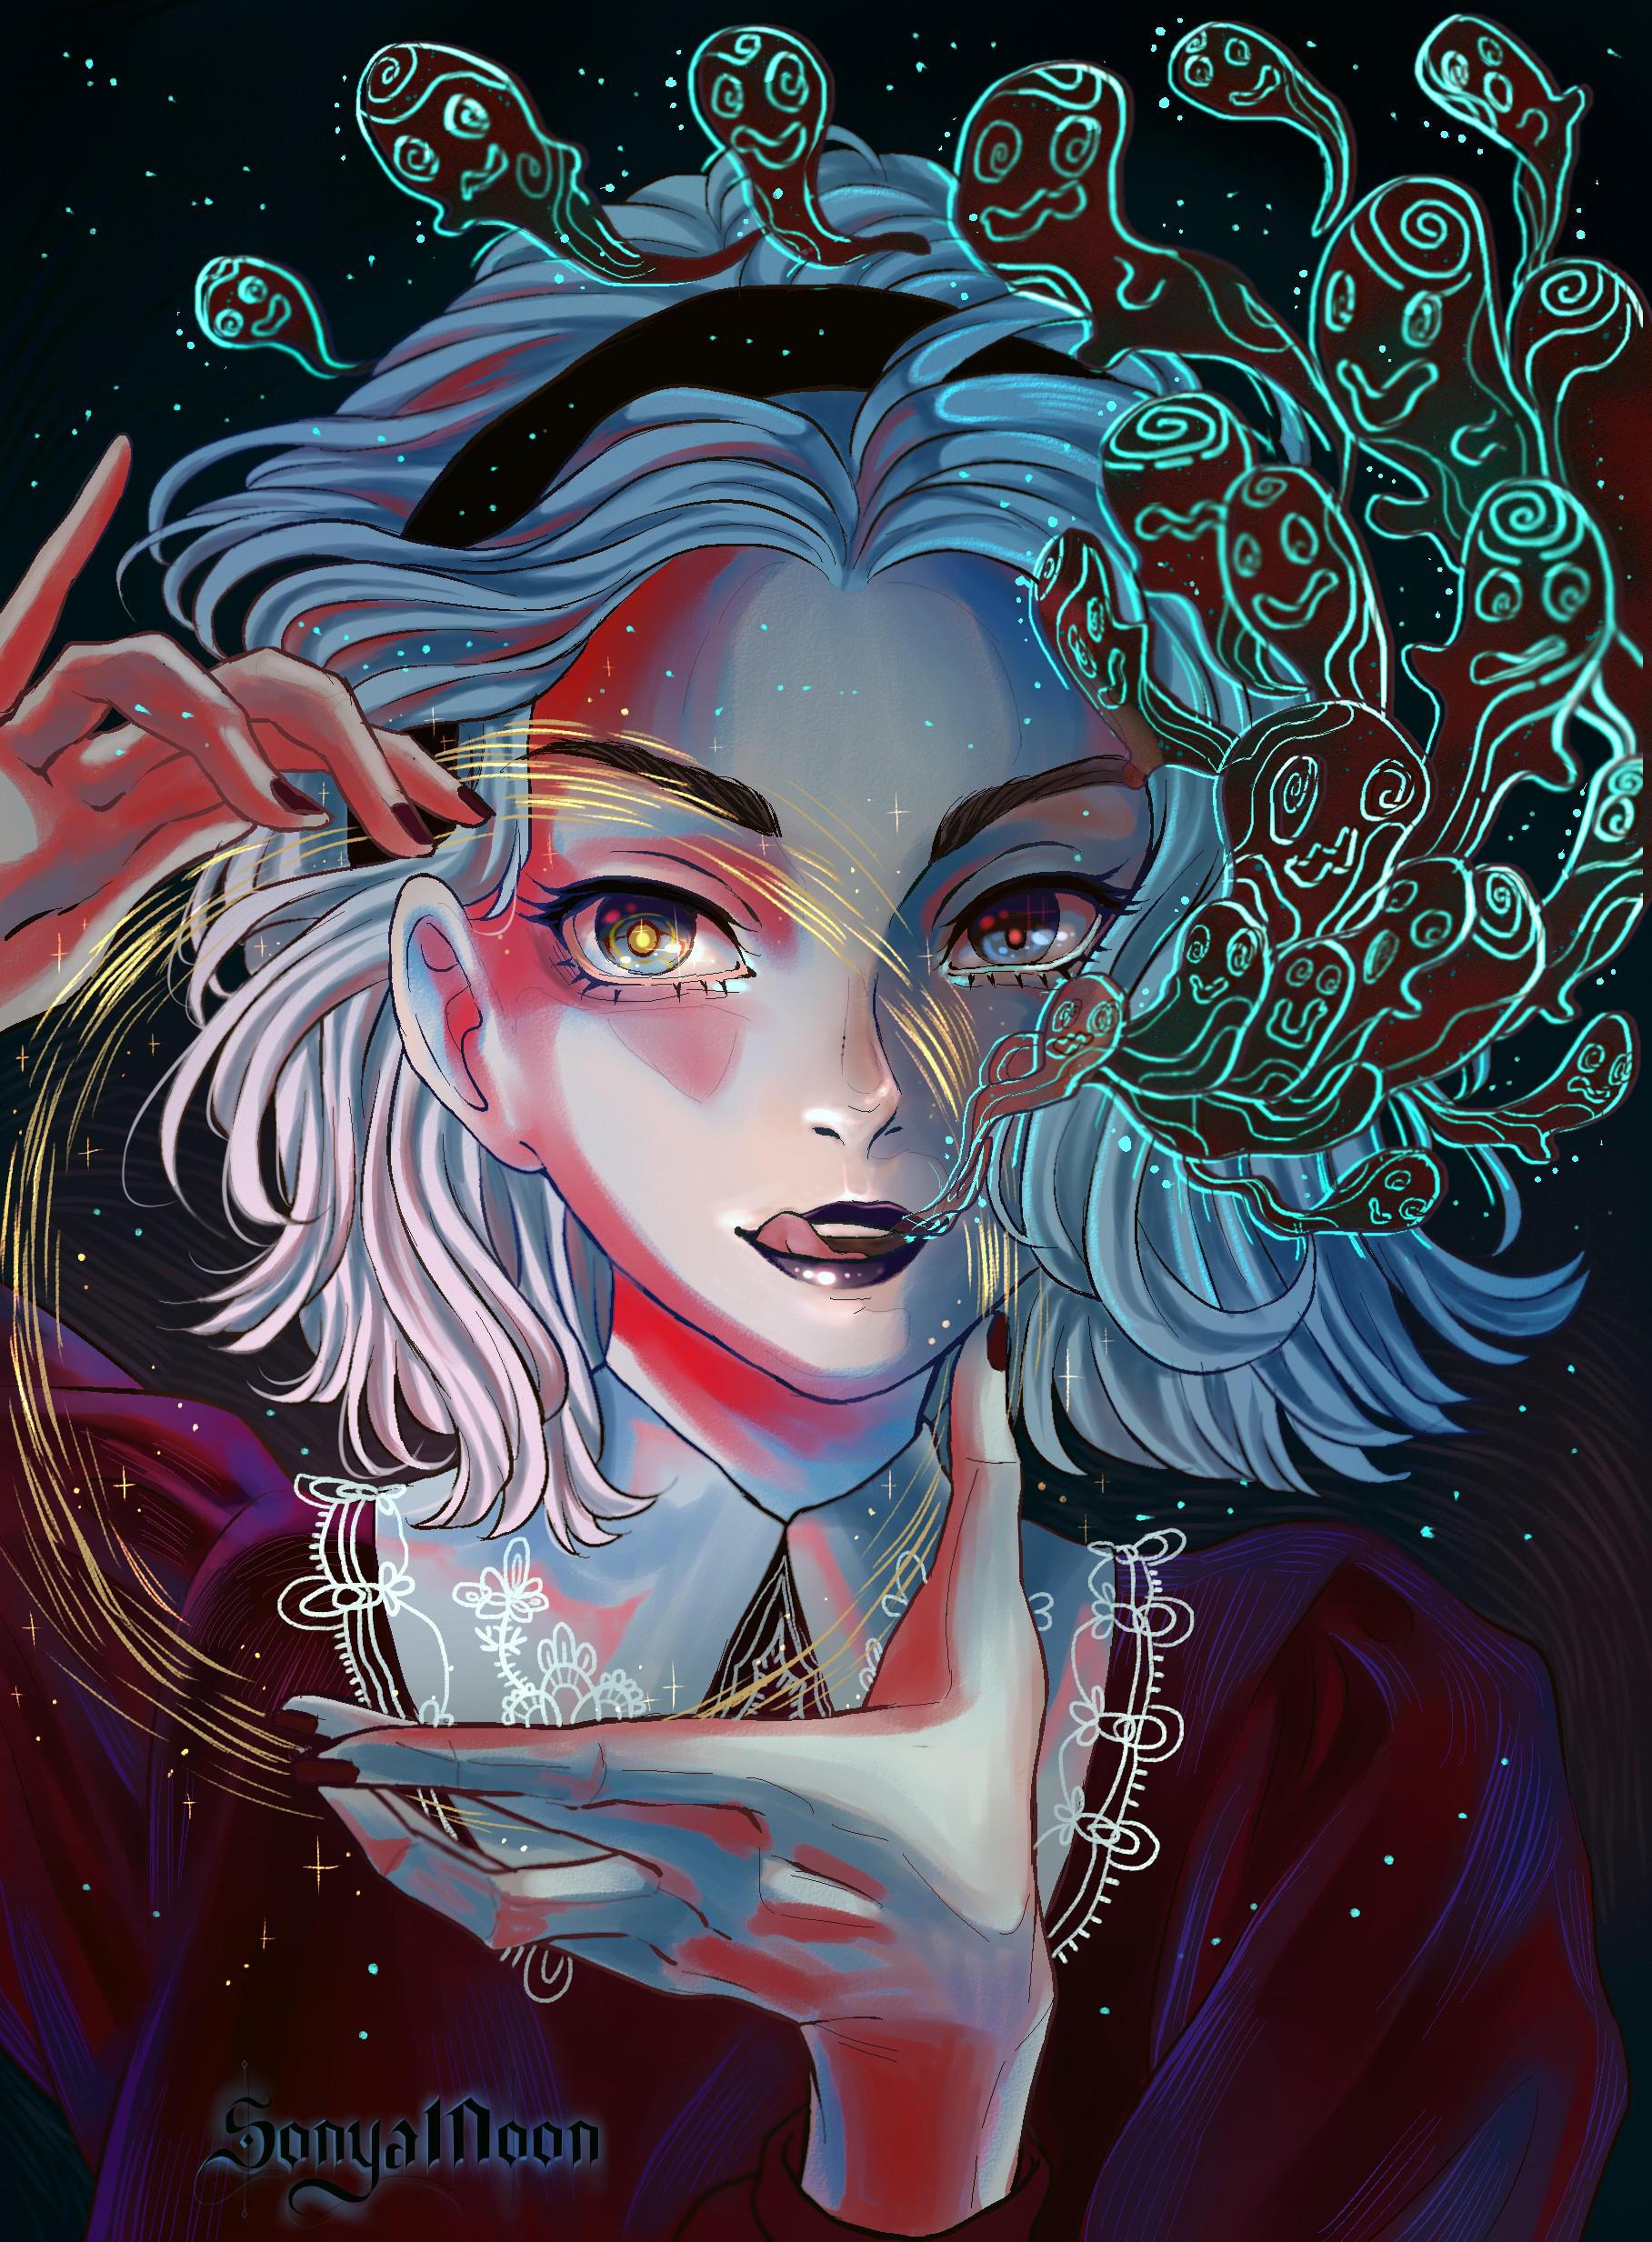 Фото Sabrina Spellman / Сабрина Спеллман из фильма и сериала Sabrina, the Teenage Witch / Сабрина — маленькая ведьма, by SonyaMoon666